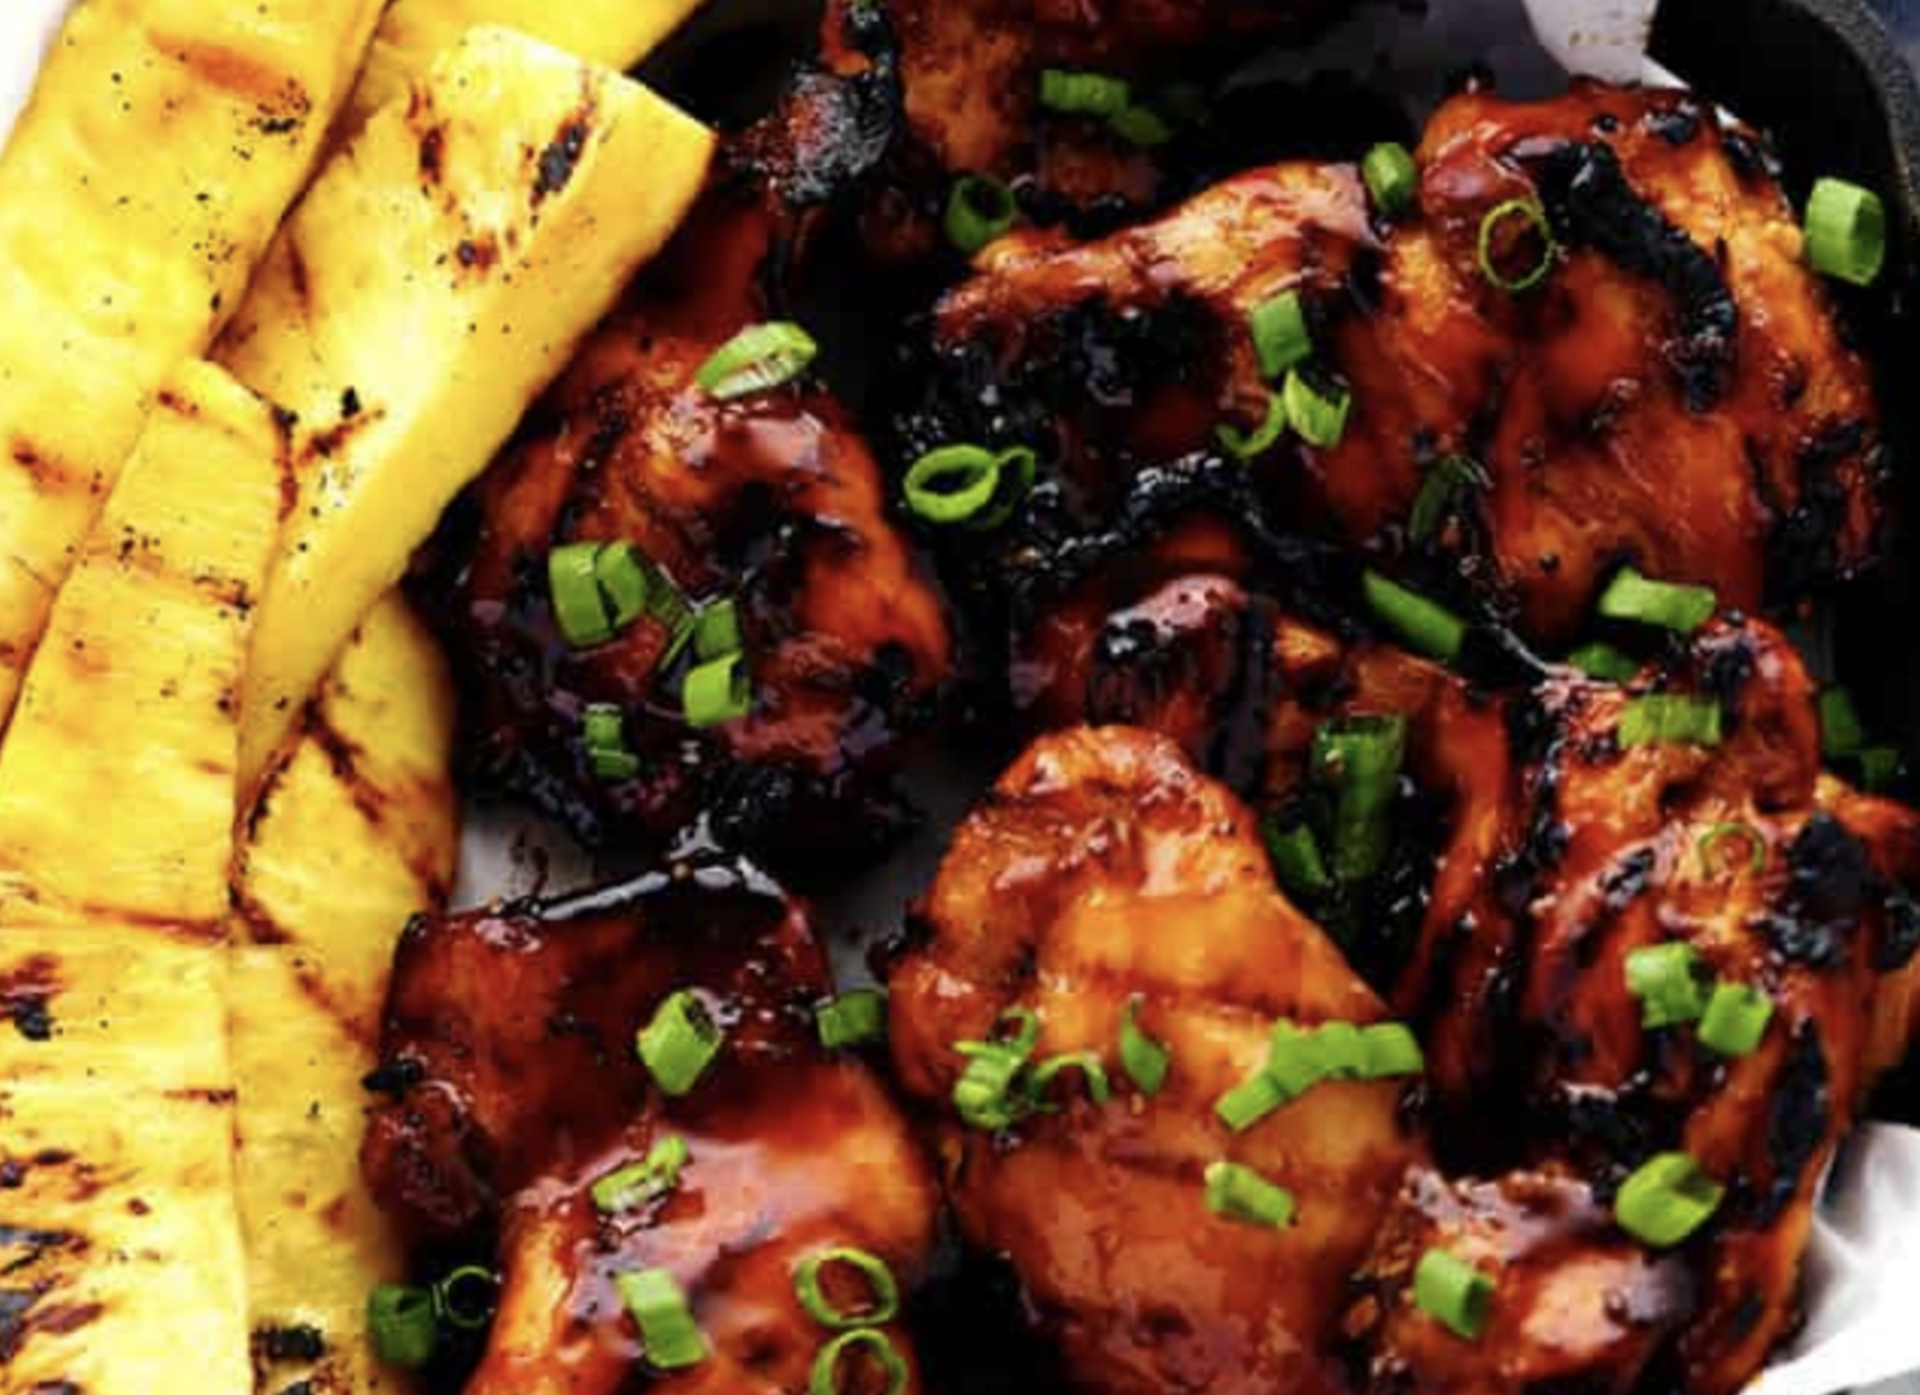 Favorite Grilling Recipes for Summertime